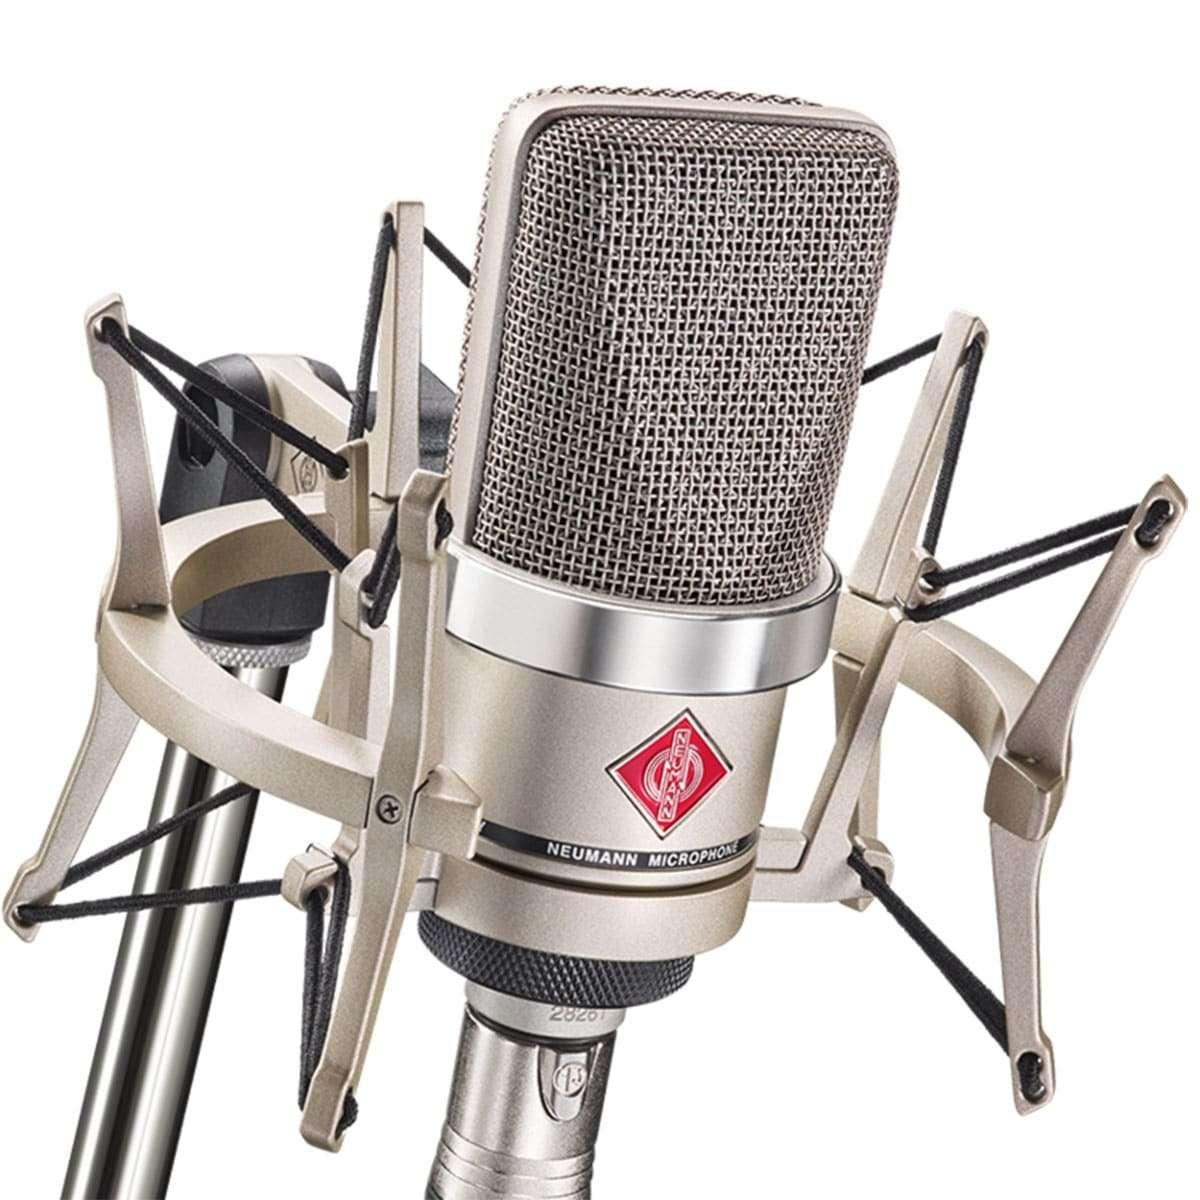 Neumann TLM 102 Studio Set 01 Neumann TLM 102 STUDIO SET